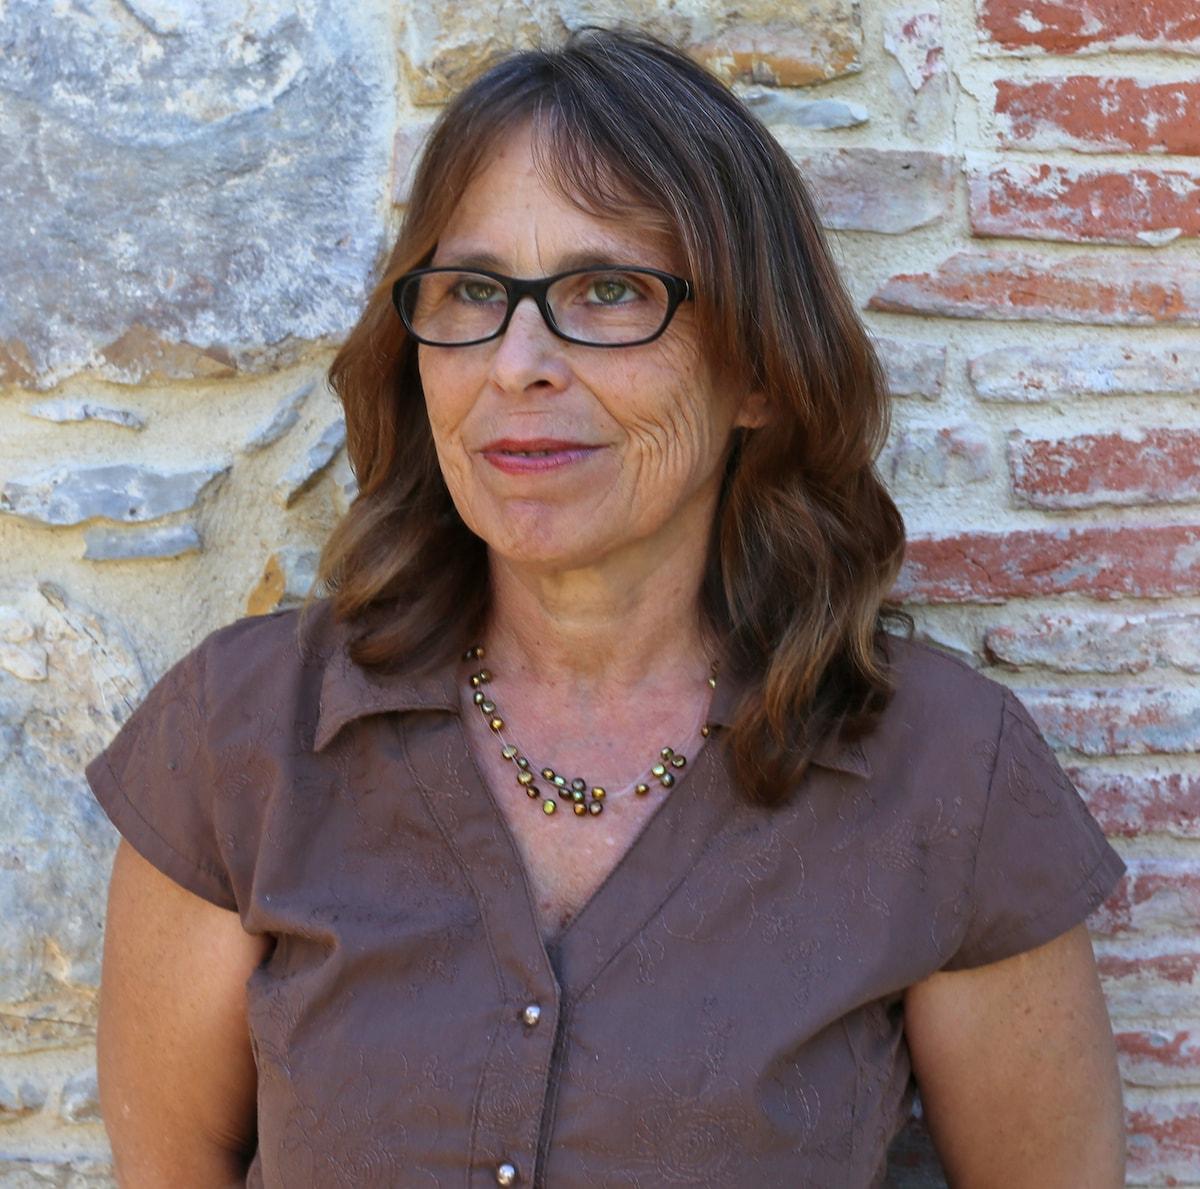 Jacobella From Bagni San Filippo, Italy